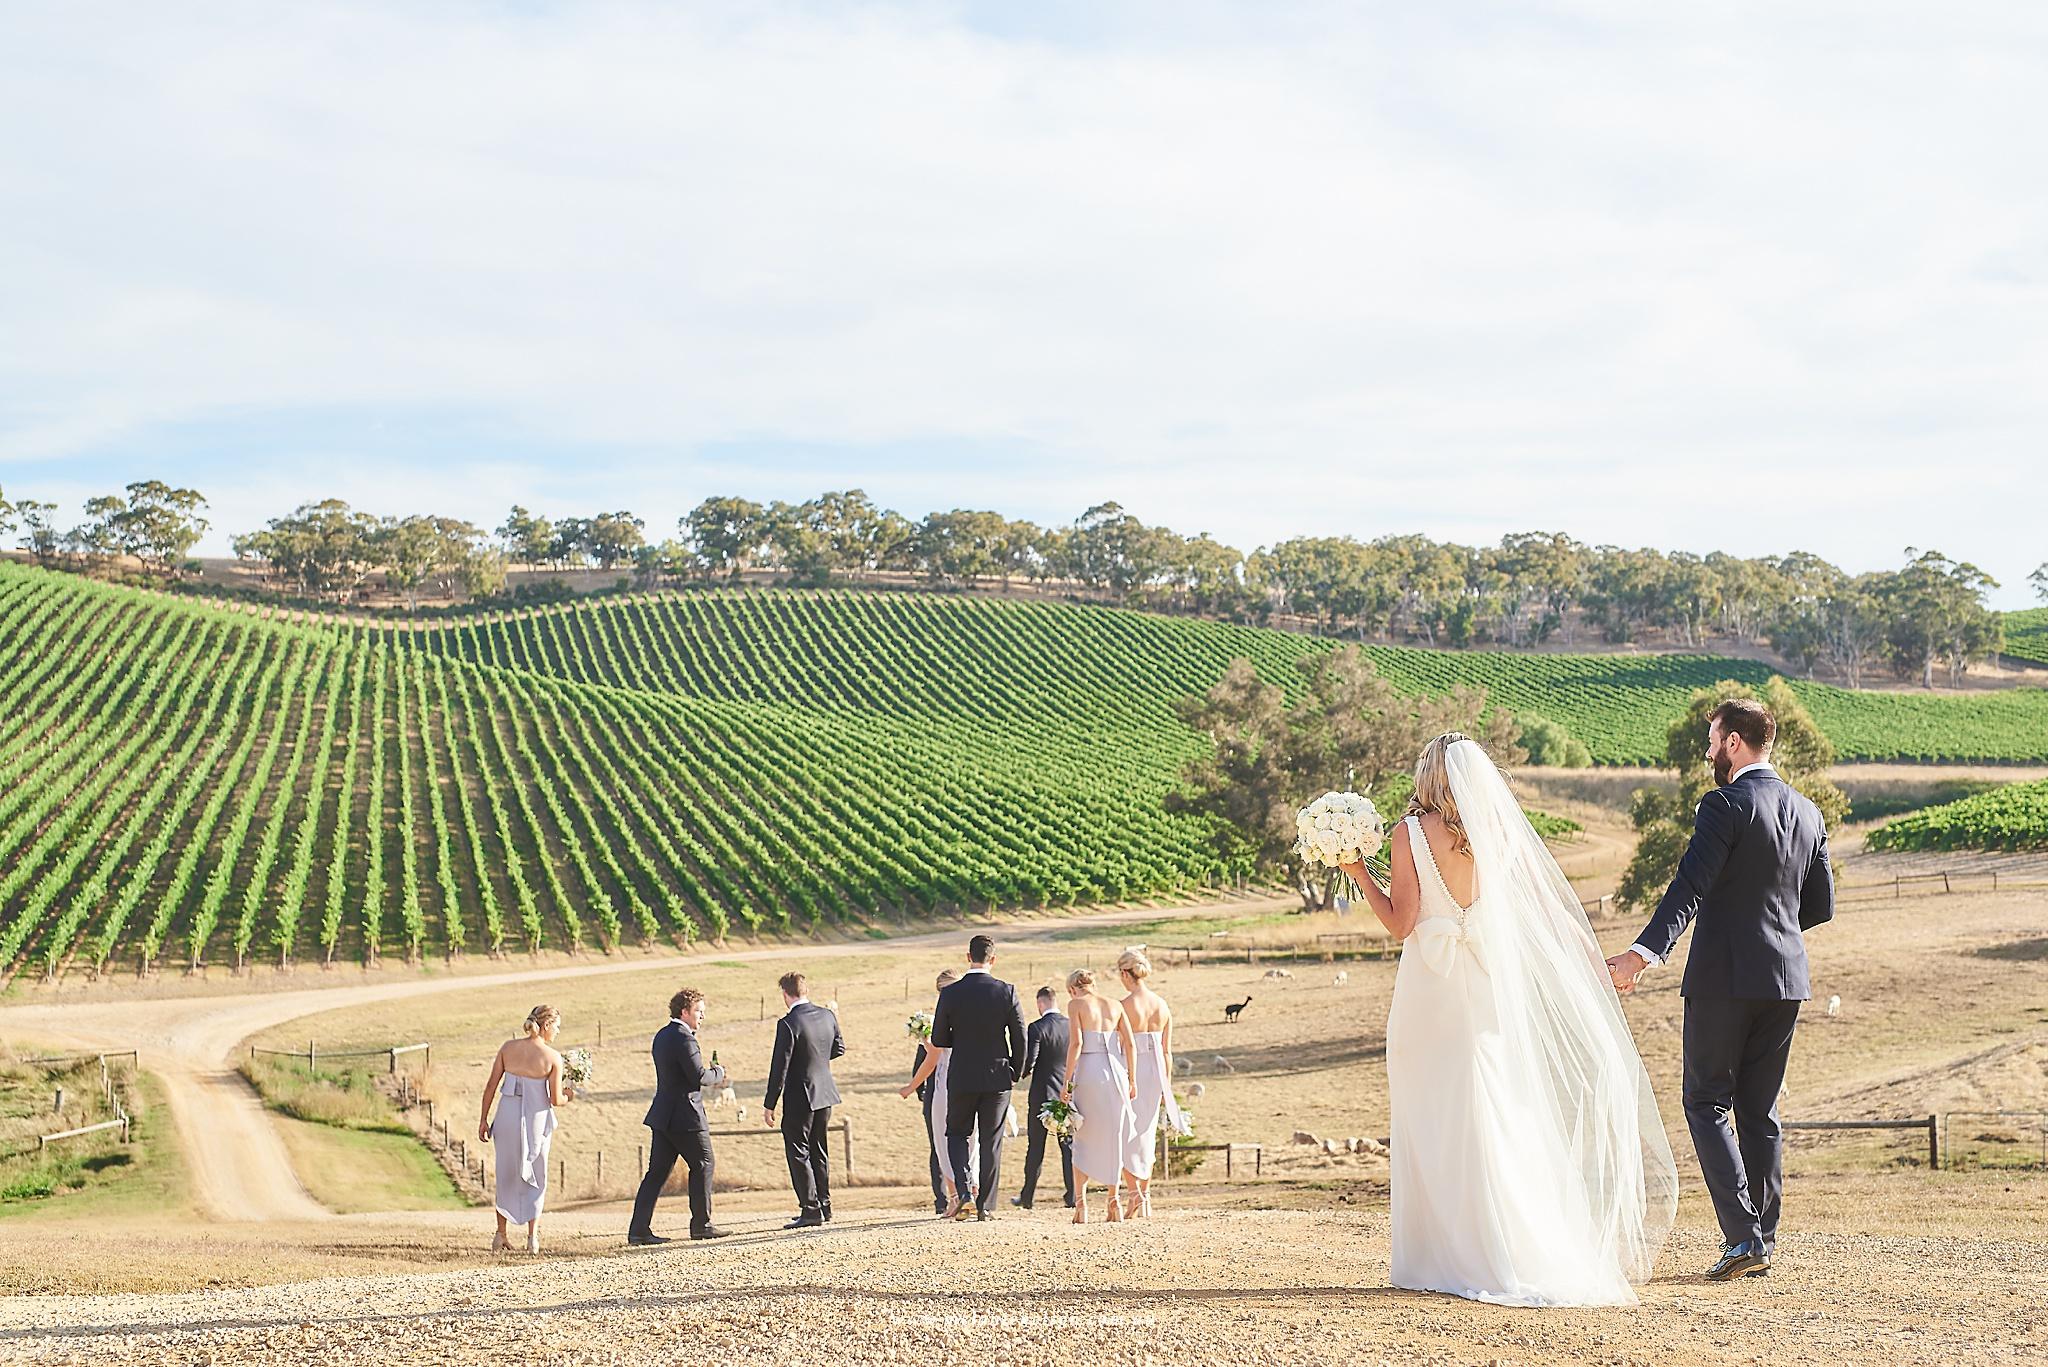 longview_vineyard_wedding_0053.jpg